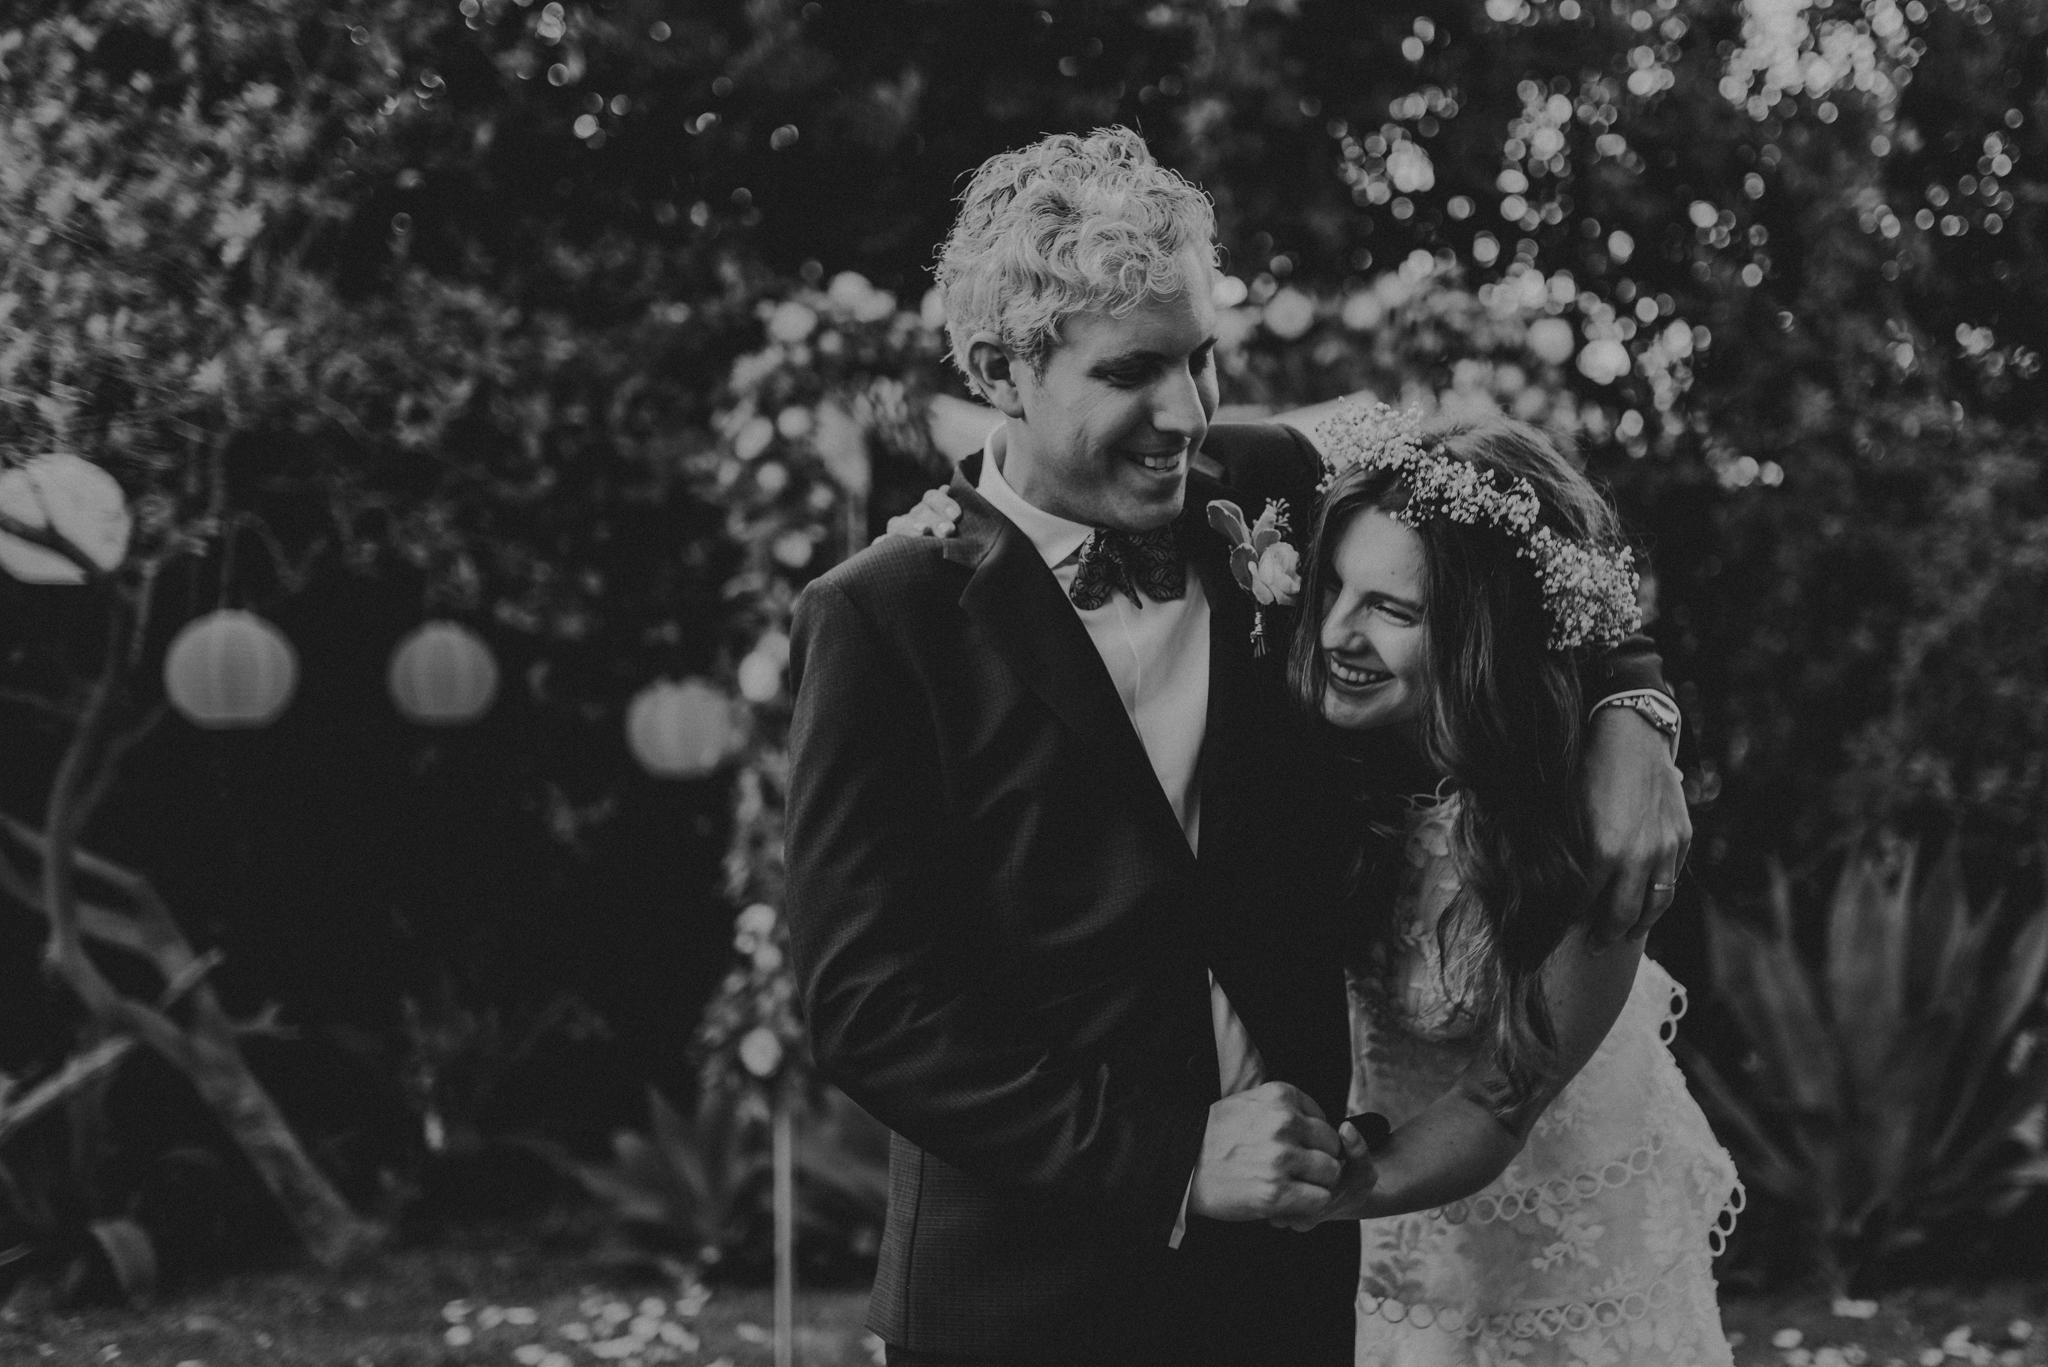 Isaiah + Taylor Photography - Private Estate Backyard Wedding - Beverly Hills - Los Angeles Wedding Photographer - 99.jpg